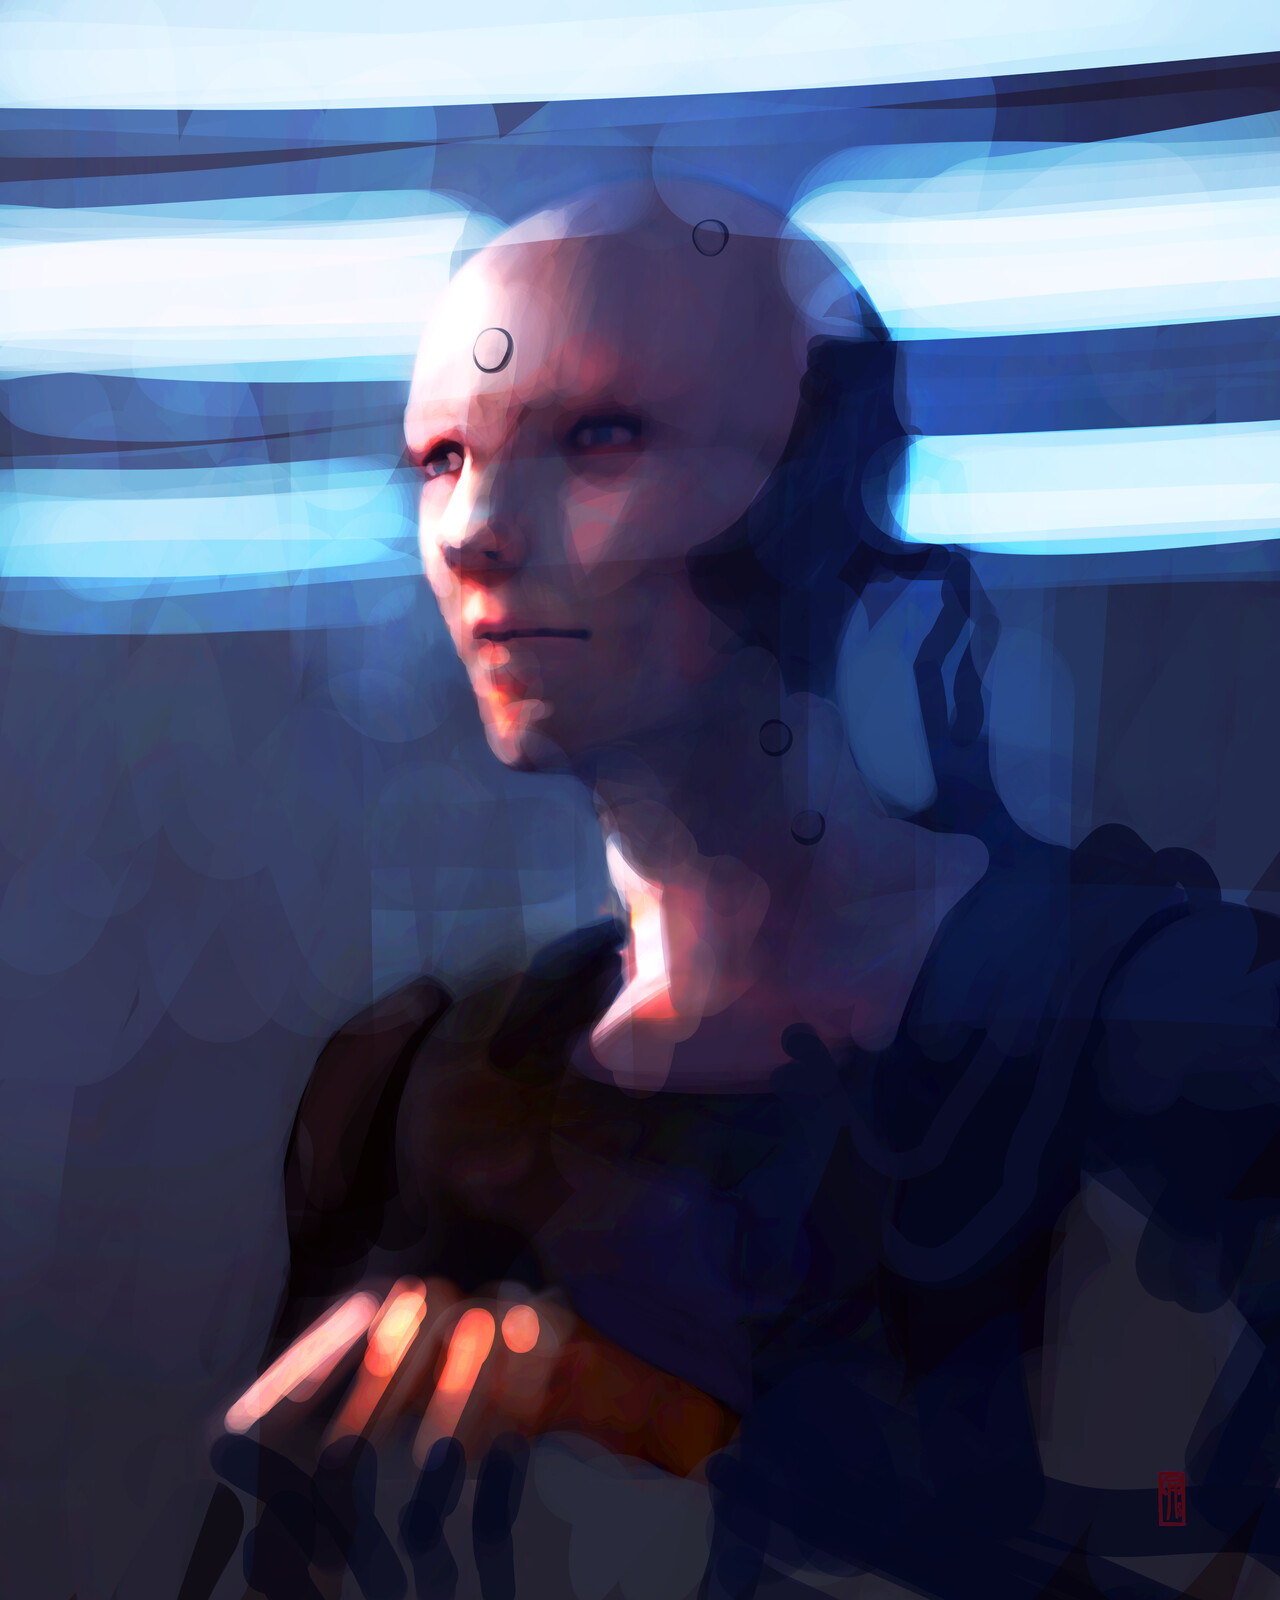 Cyberpunk_Dude//001